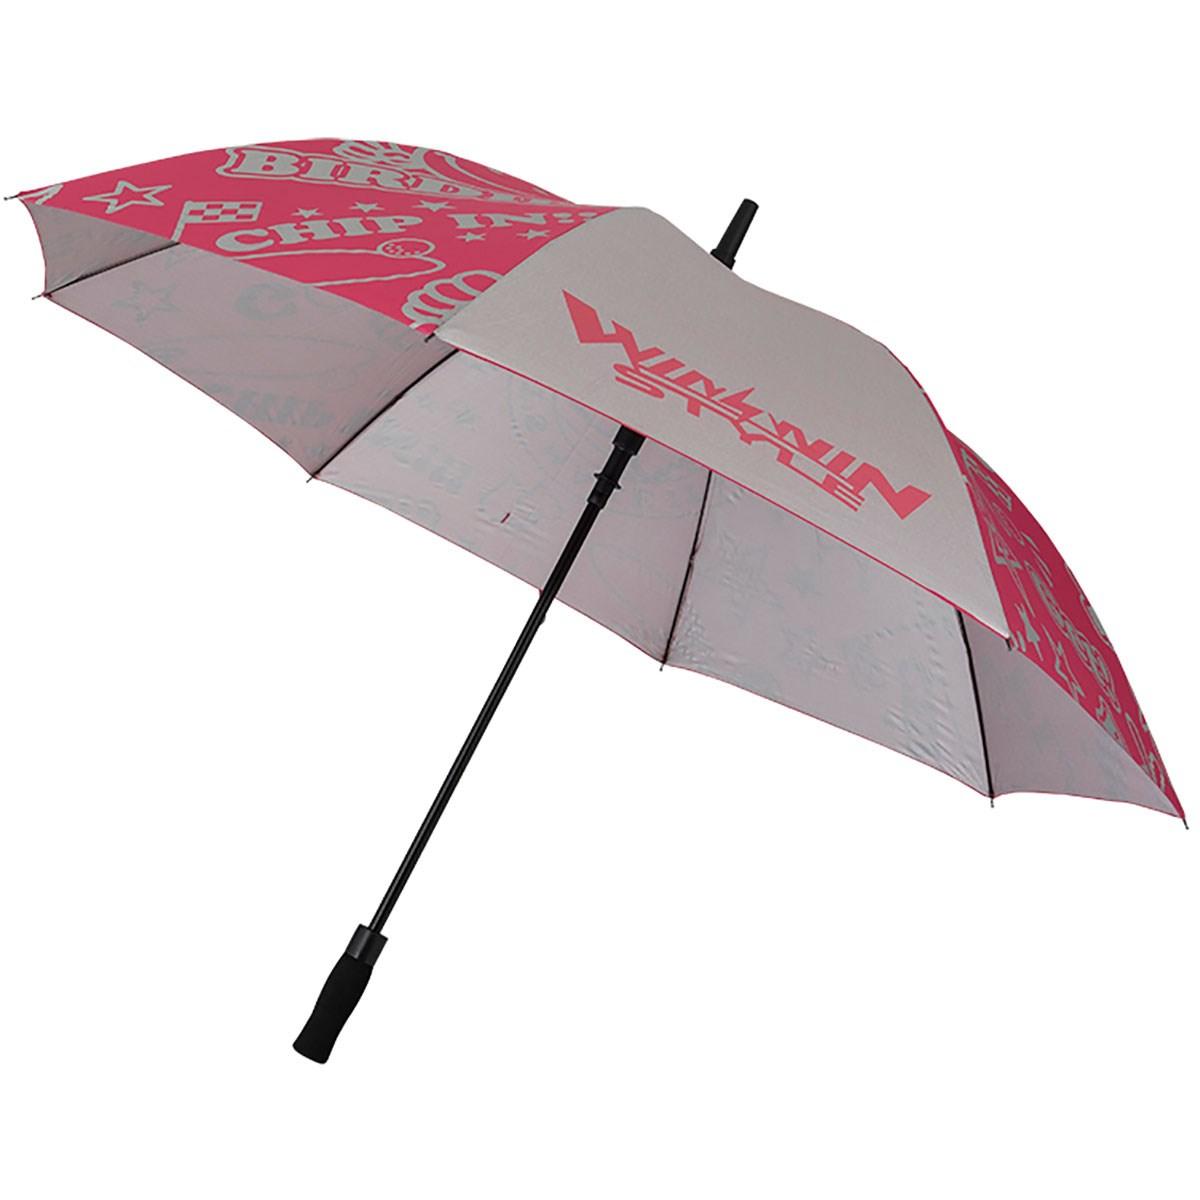 WINWIN STYLE ウィンウィンスタイル 傘 ピンク